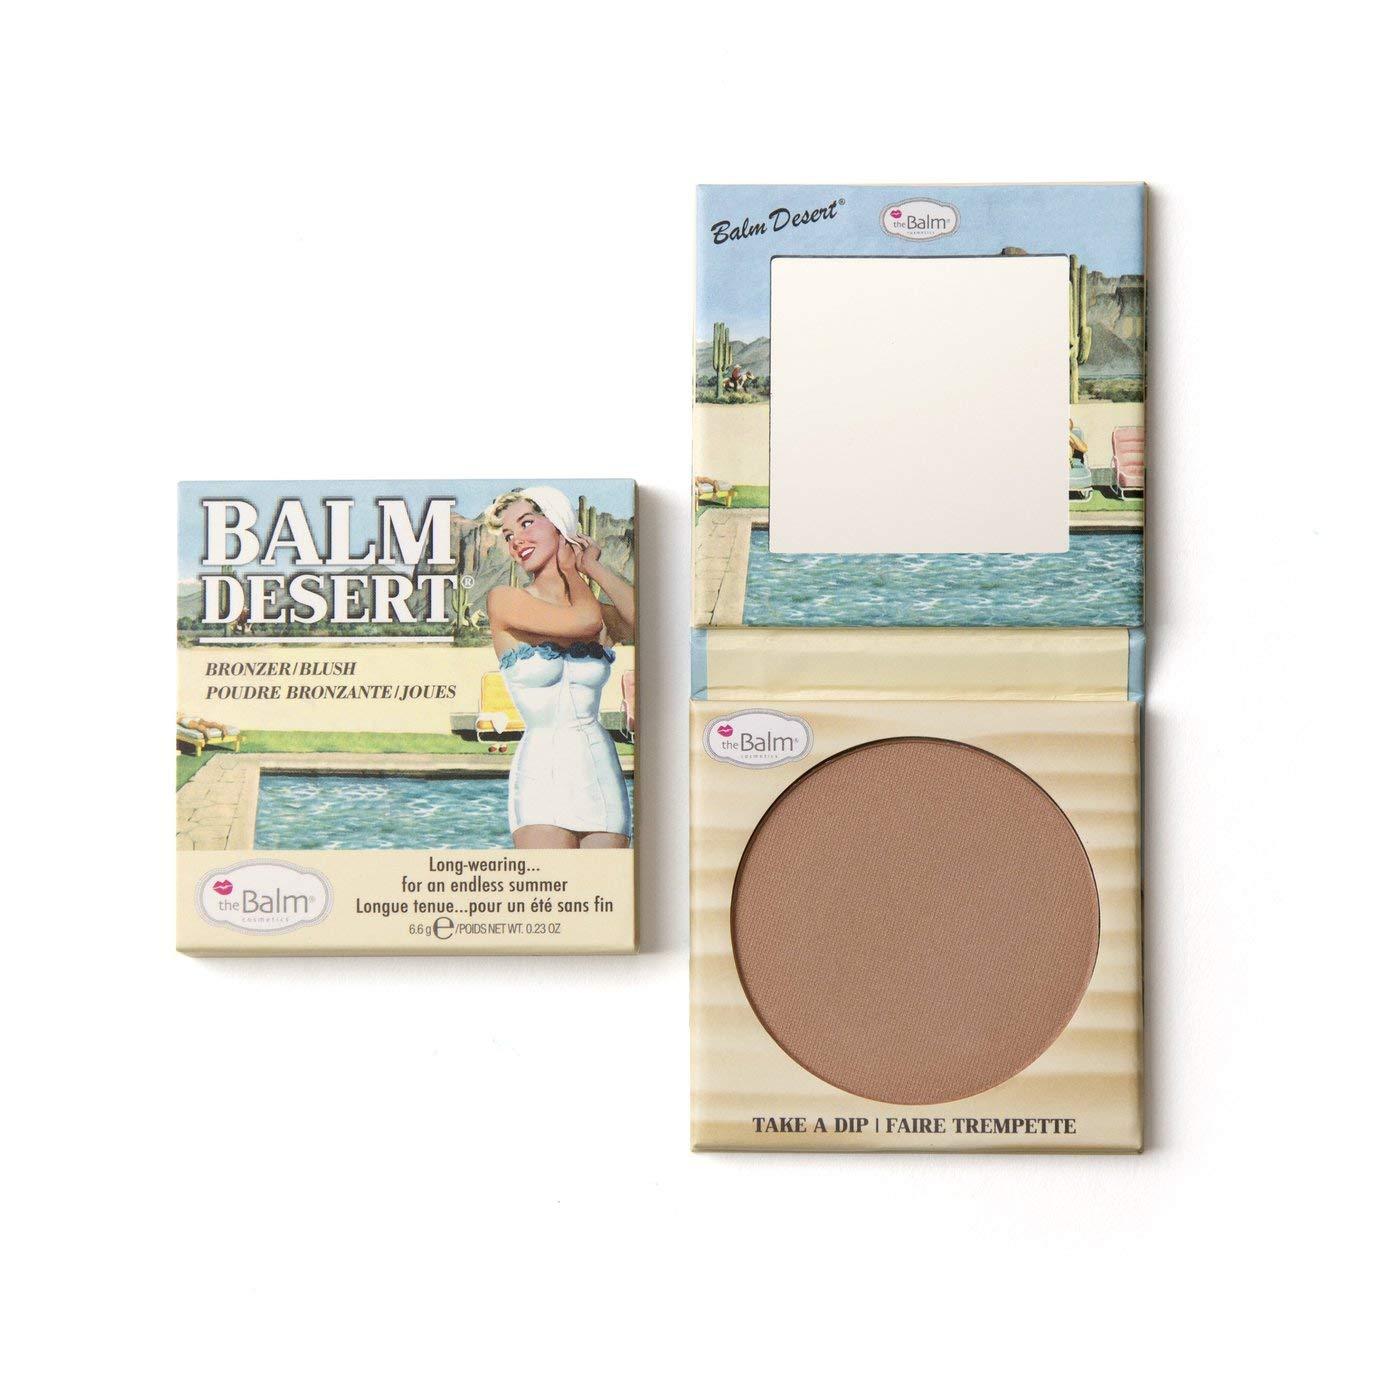 Desert Long-Lasting Bronzer/Blush, Natural Glow, Fade-Resistant